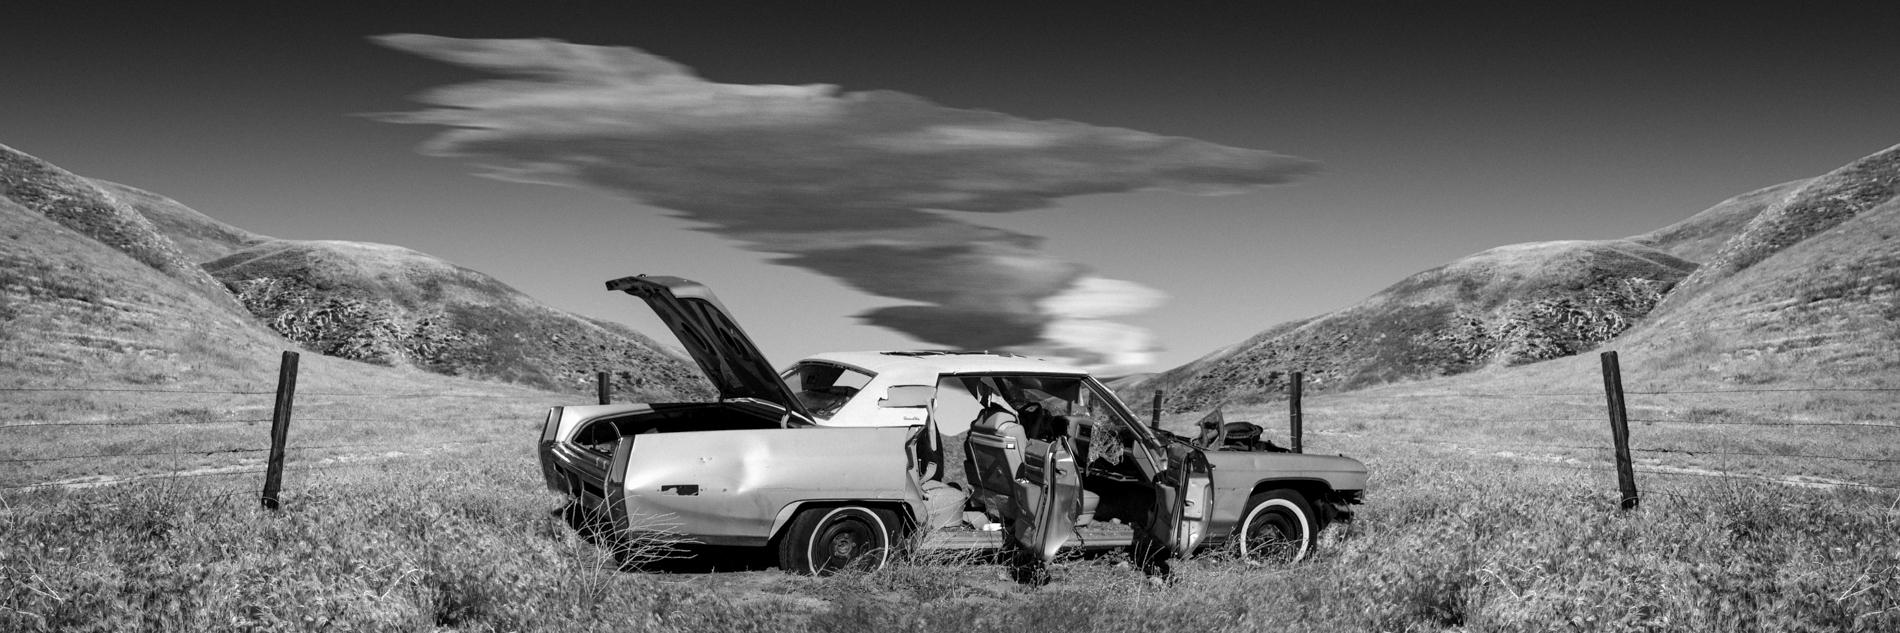 PastoralWreckageBruce Burr - 1900x72ppi.